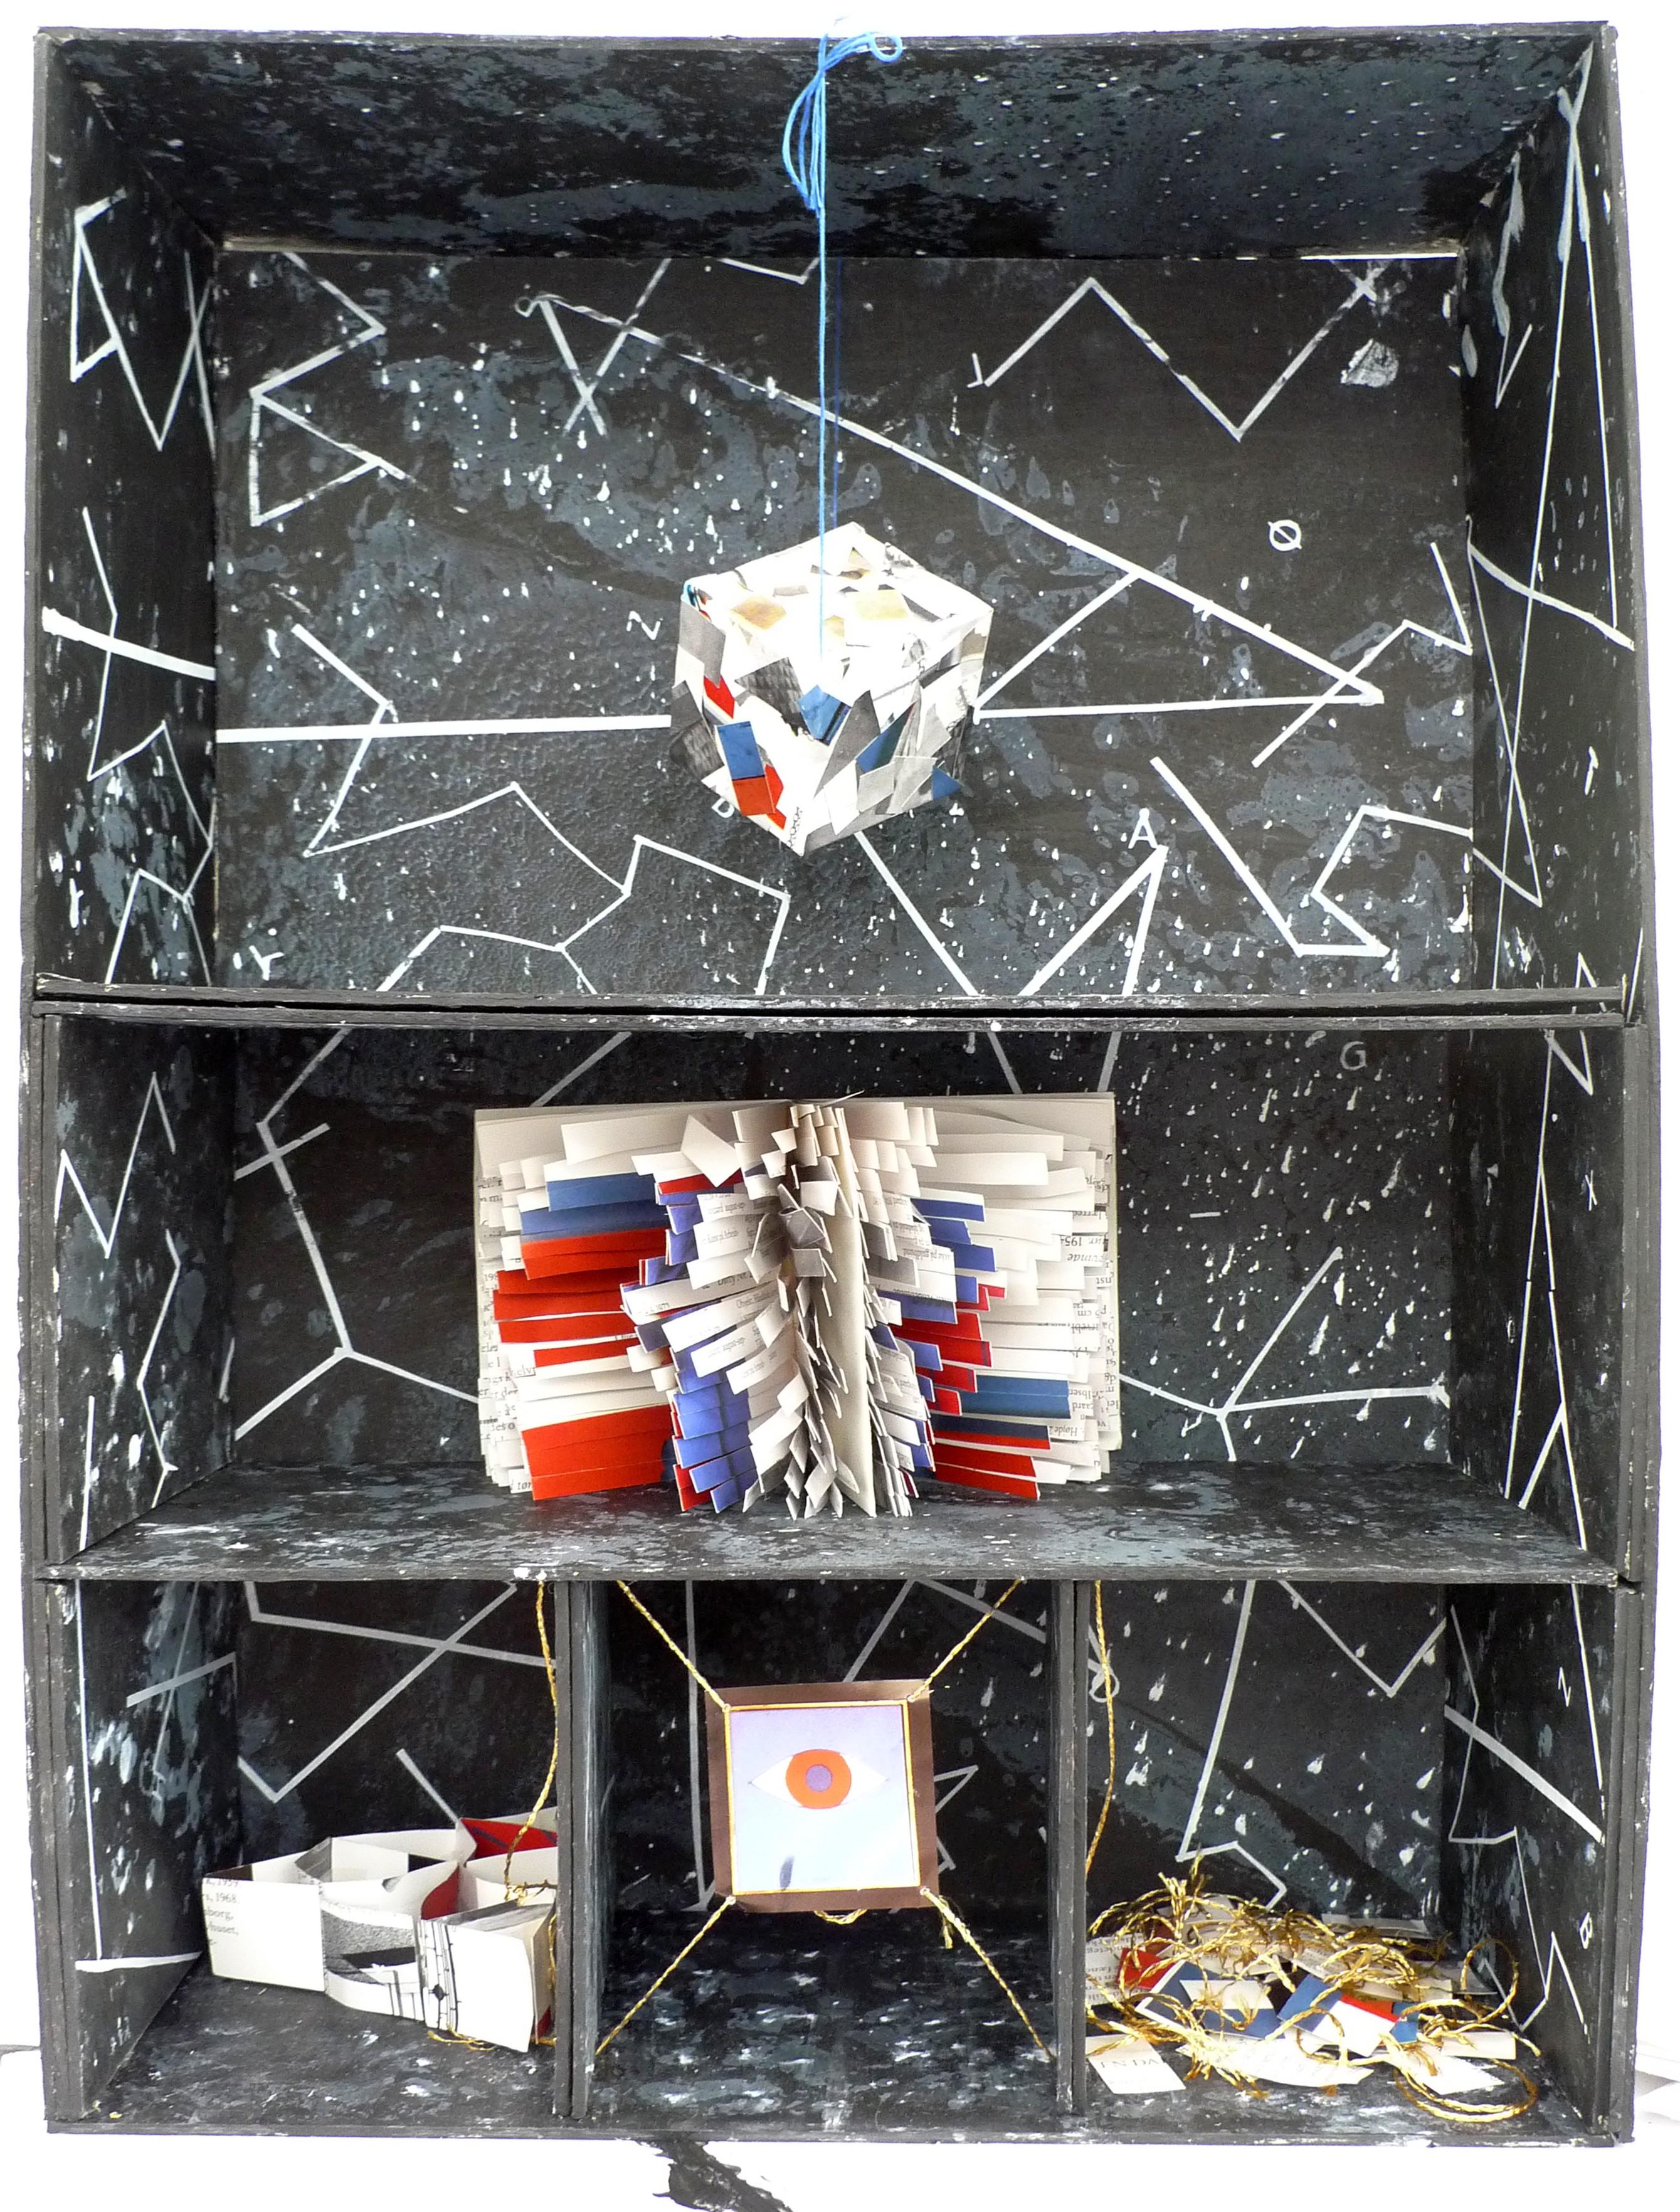 Serigrafi - Efterår 2015 - Kunsthøjskolen